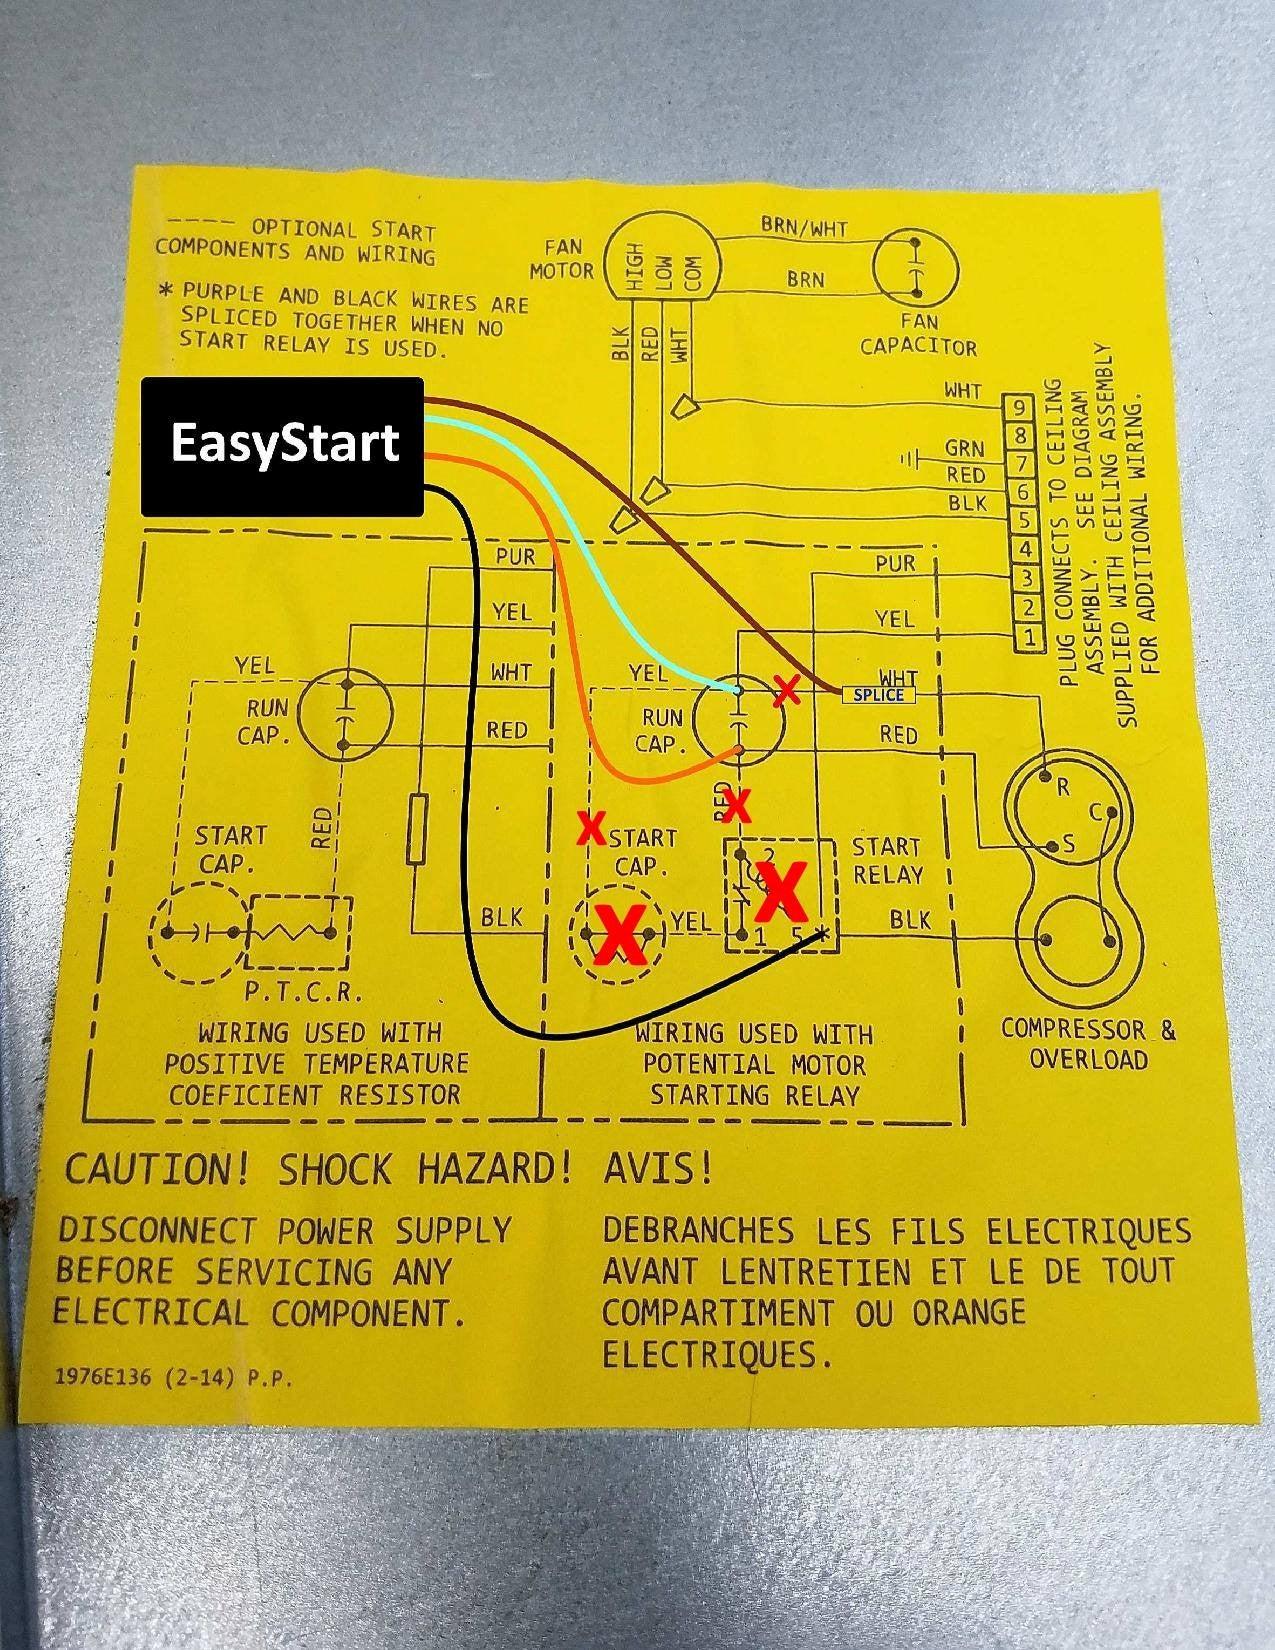 medium resolution of coleman mach 1 easystart 364 wiring diagram